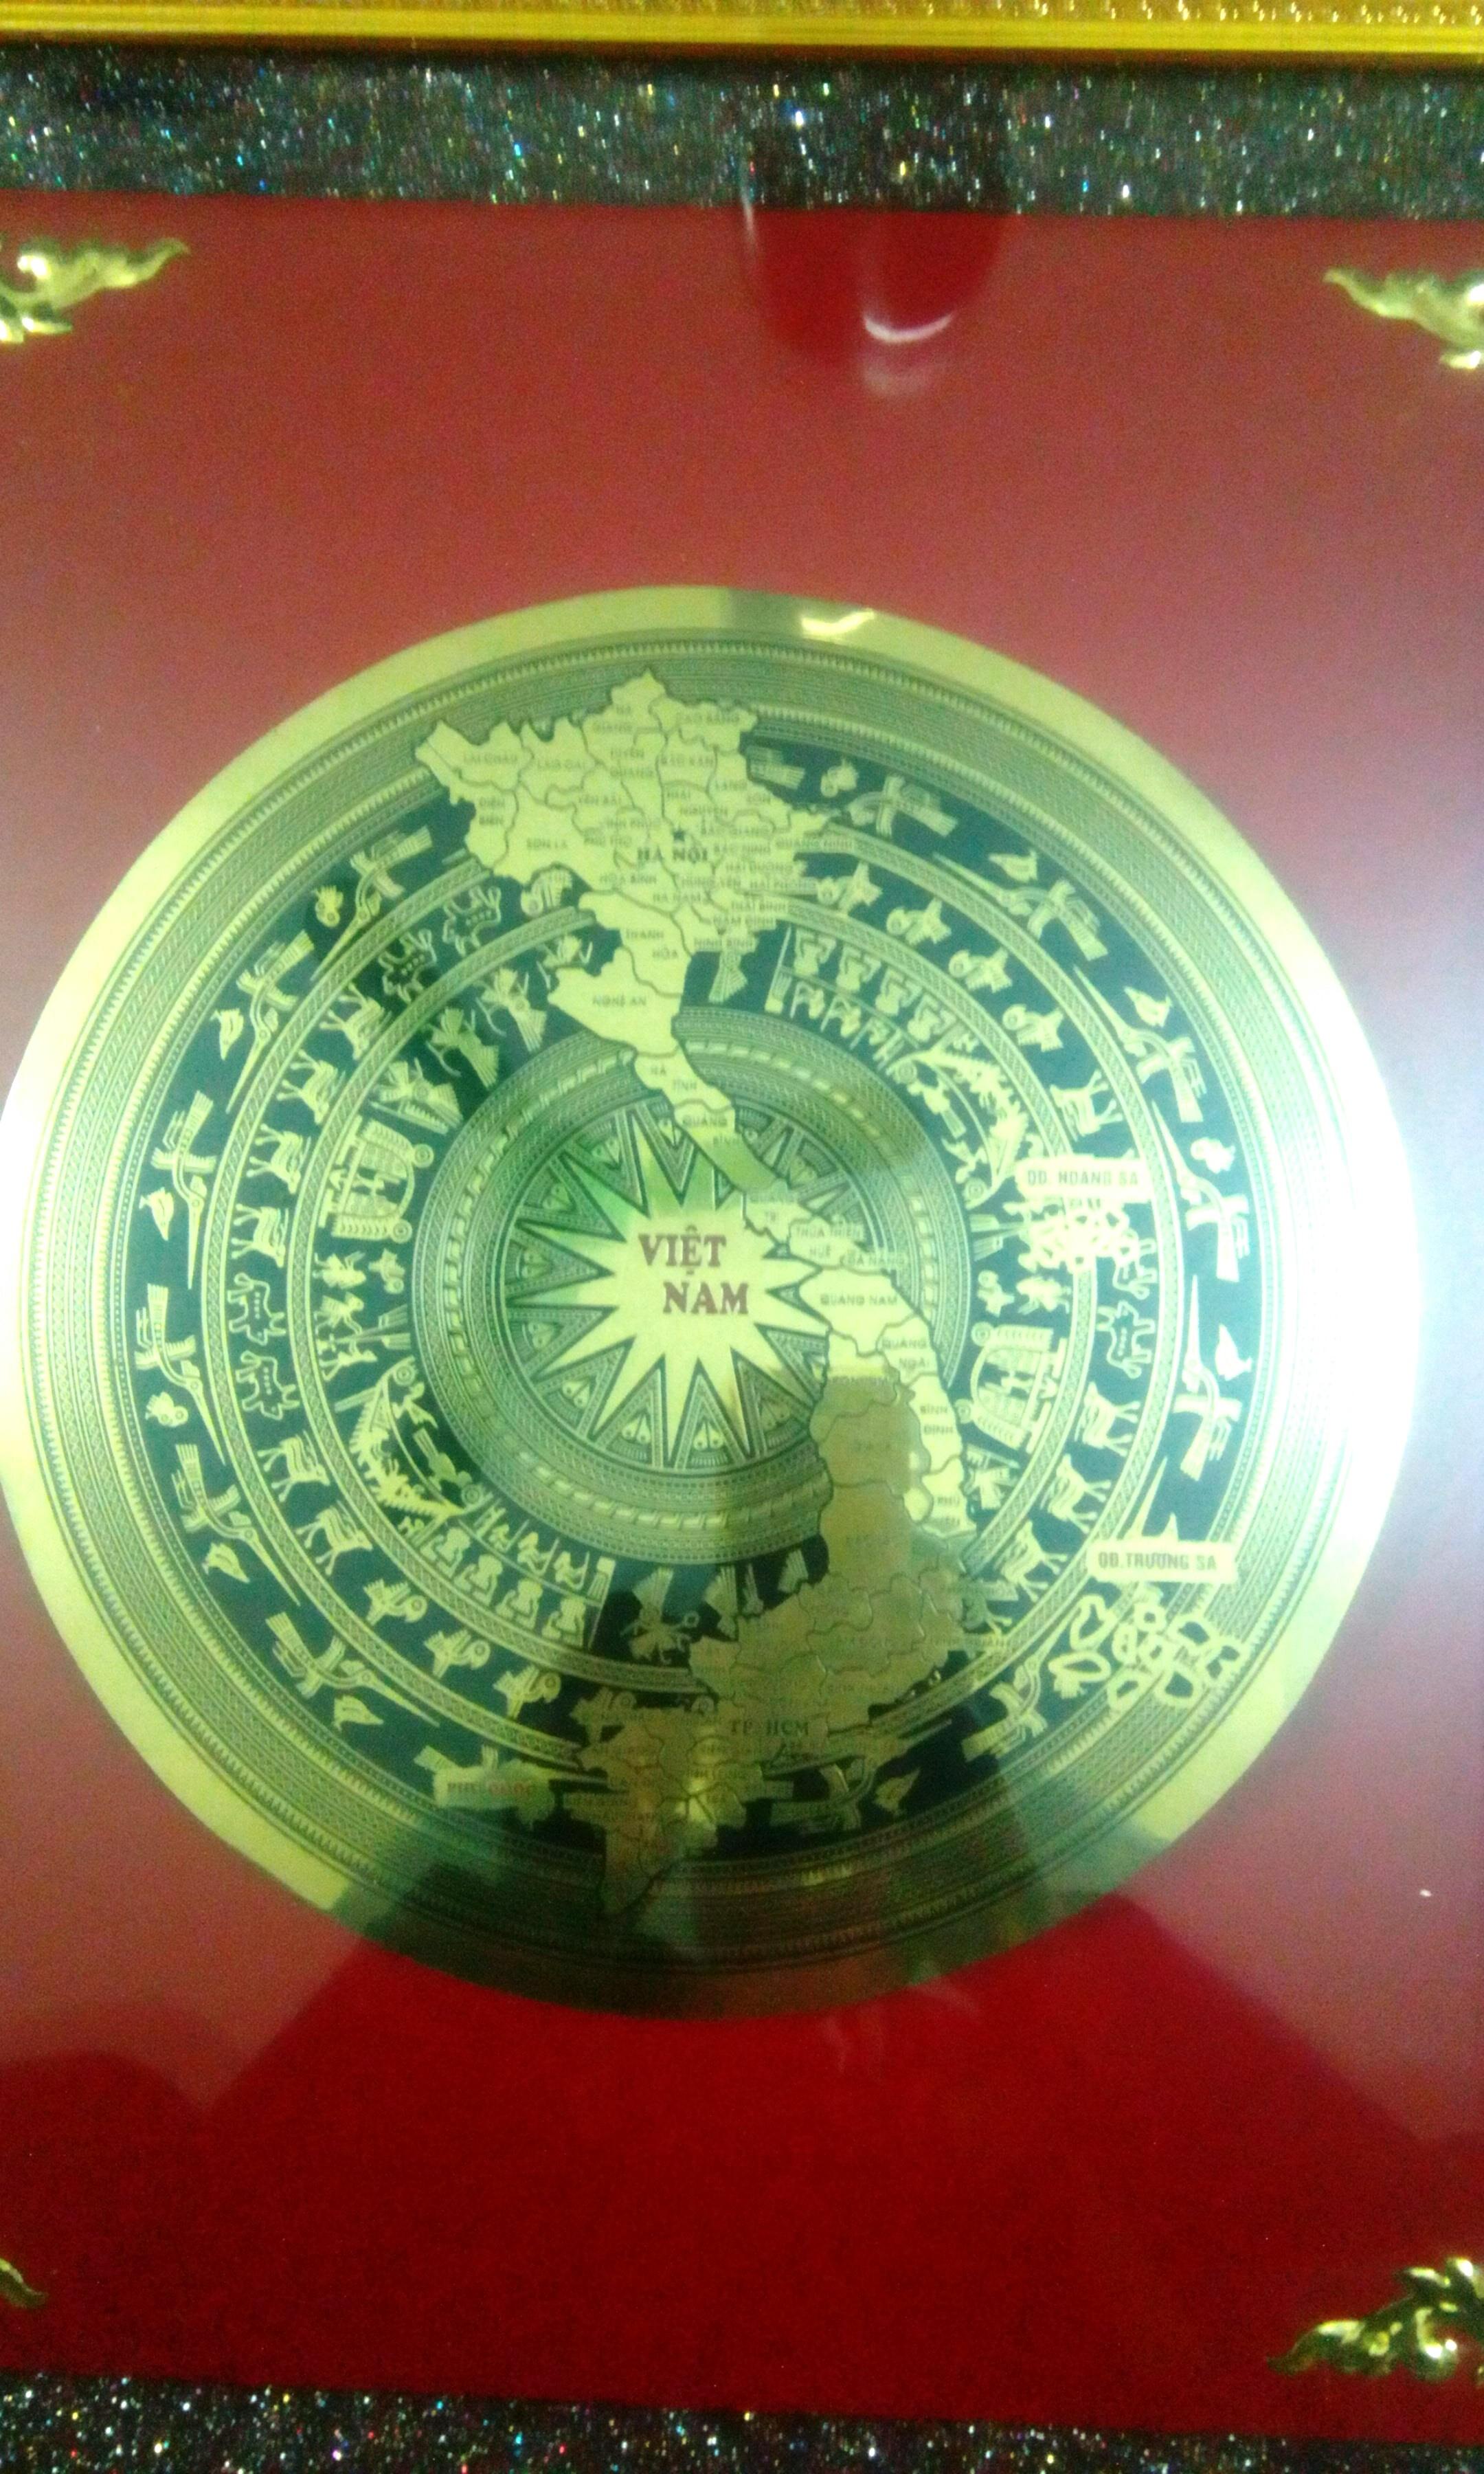 Tranh trống đồng kt 60x60cm